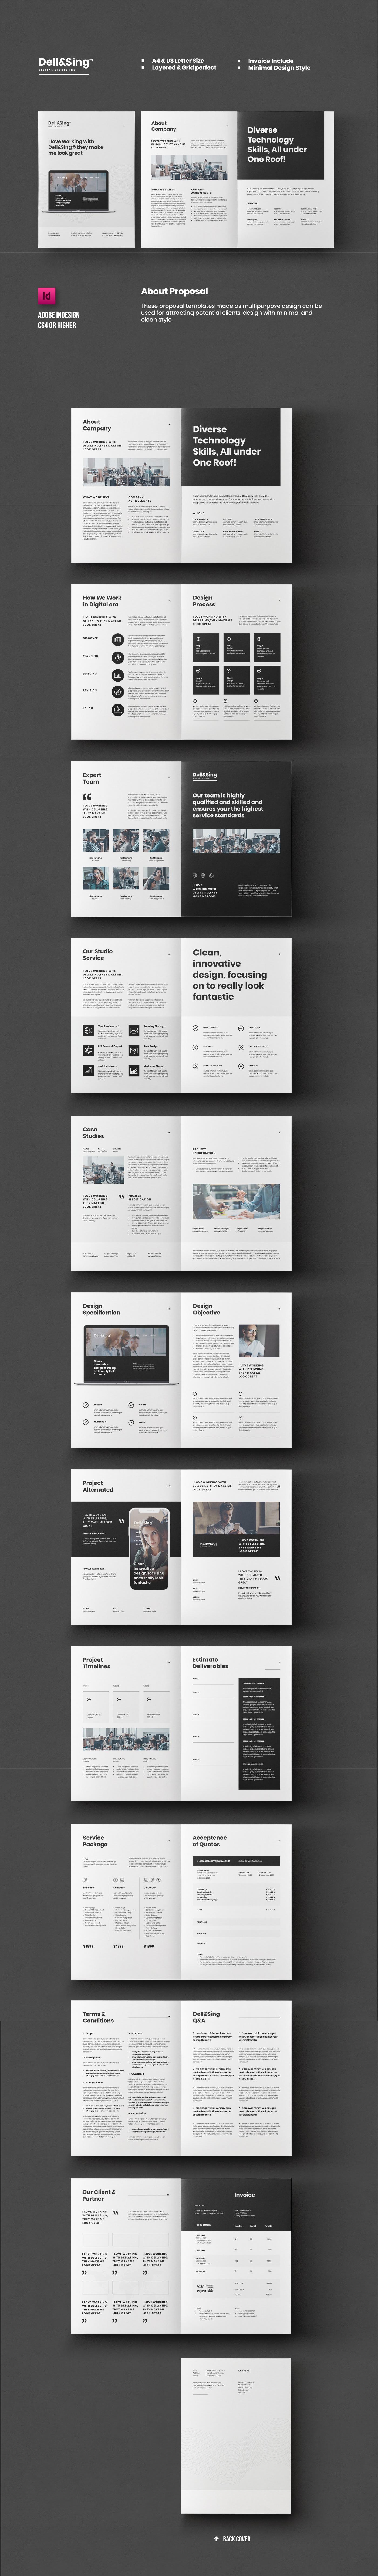 agency proposal digital proposal project proposal web design proposal studio design Studio Design Proposal Invoice Template Digital Design Template